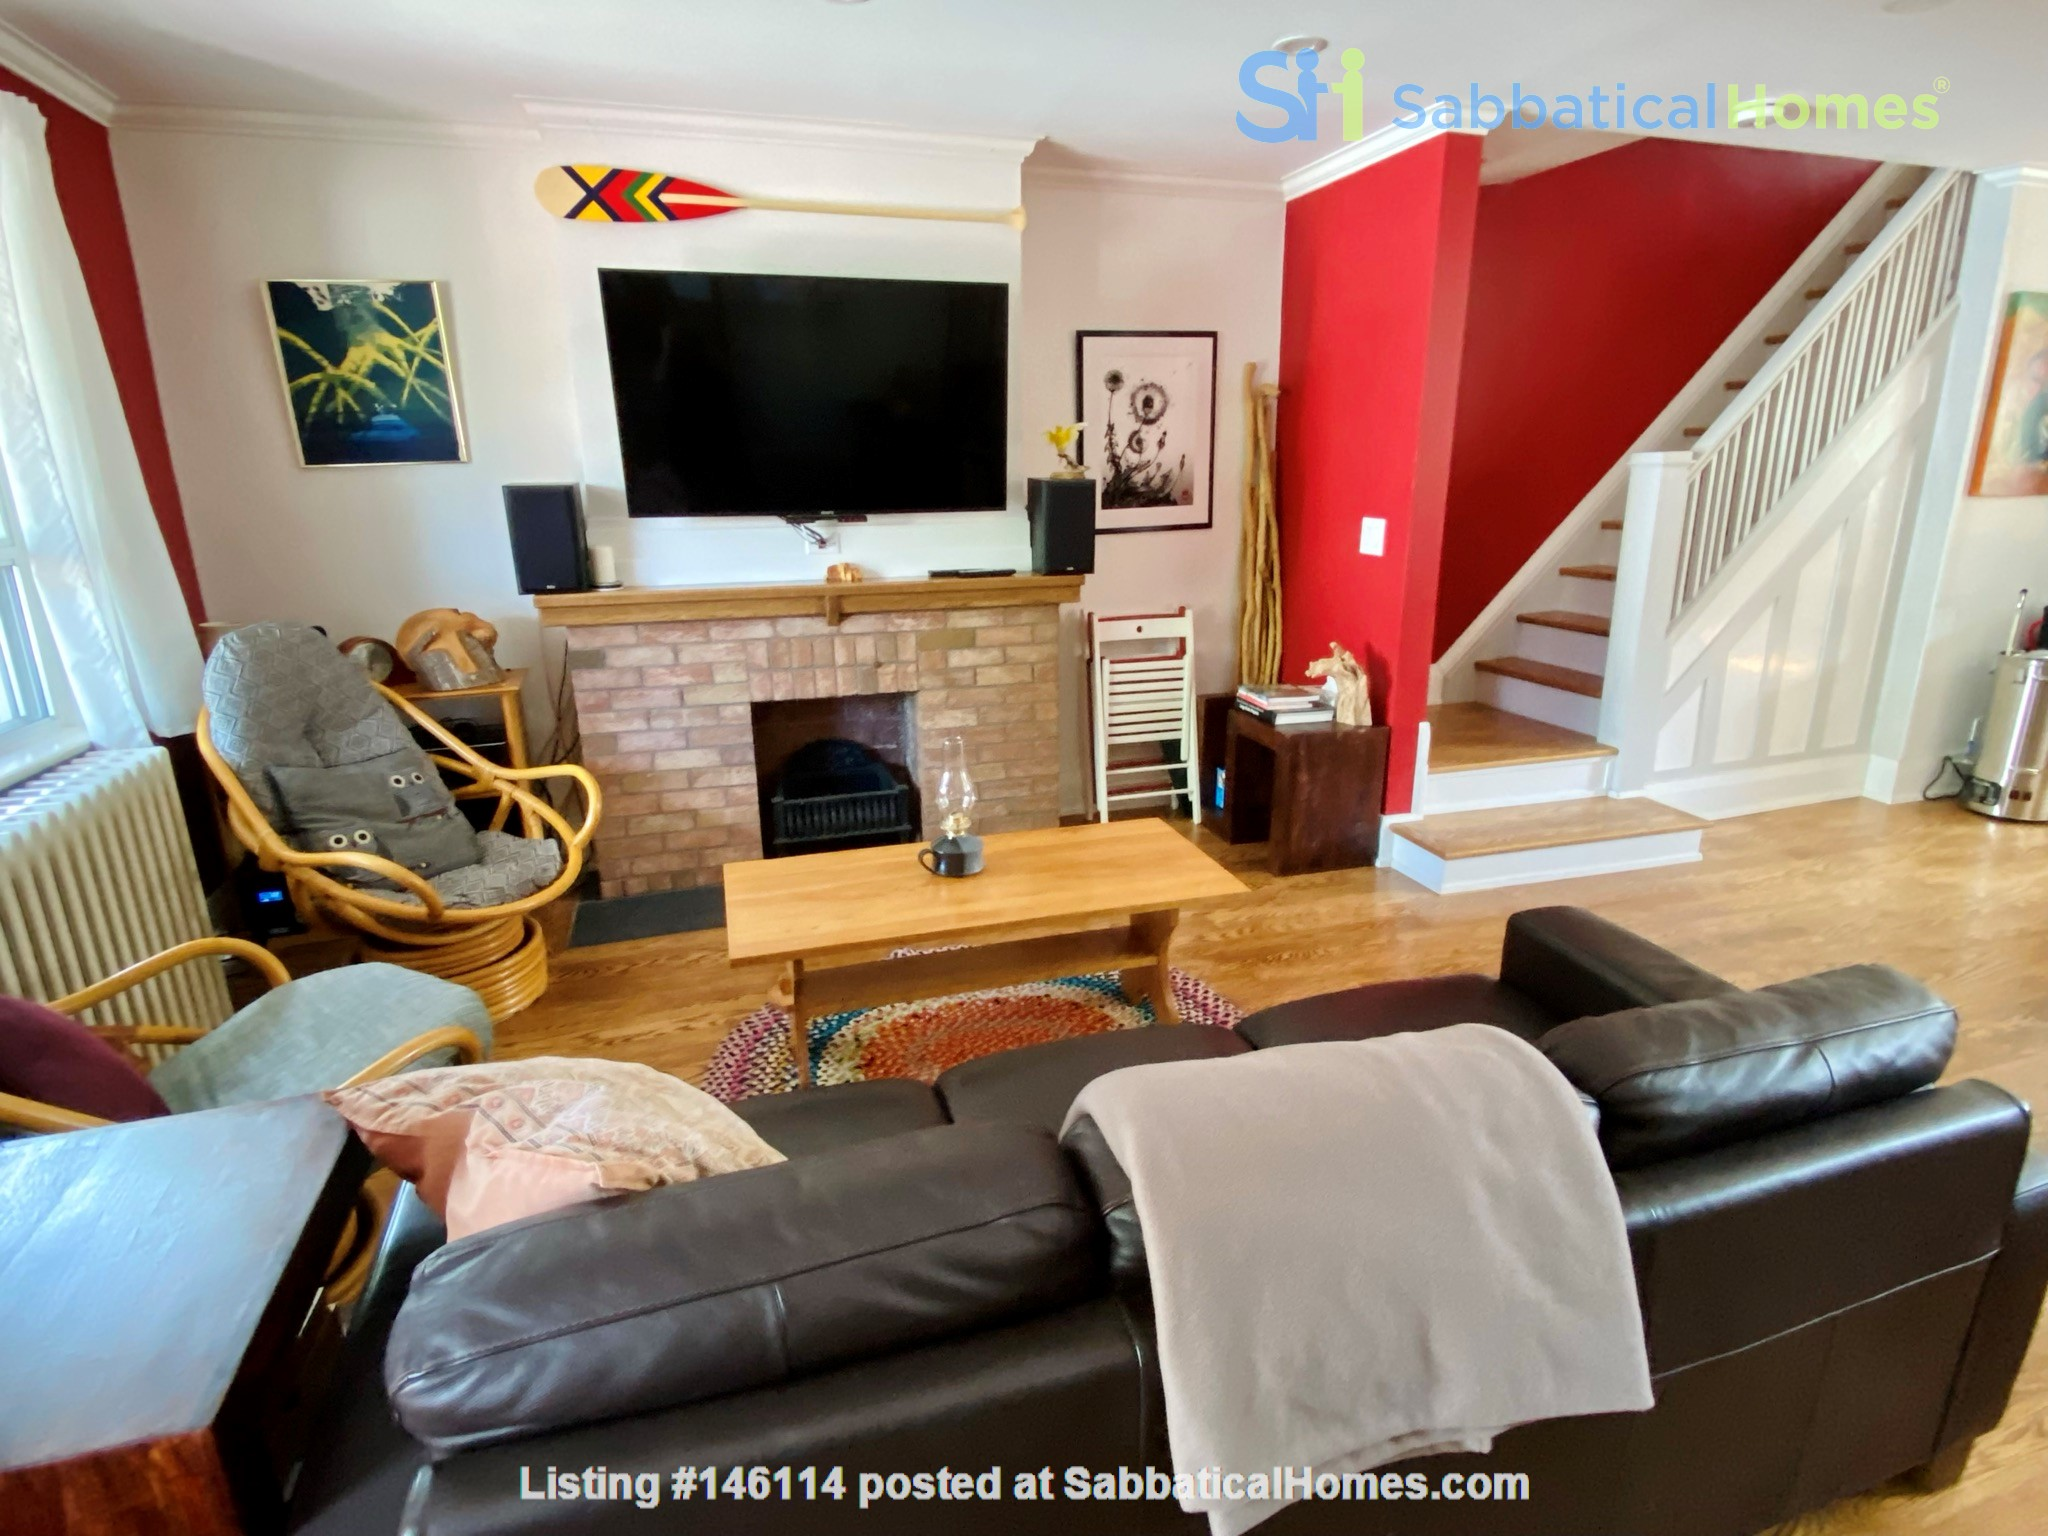 Charming 3 bdrm garden home for rent near The Danforth (w/backyard&parking) Home Rental in Toronto 3